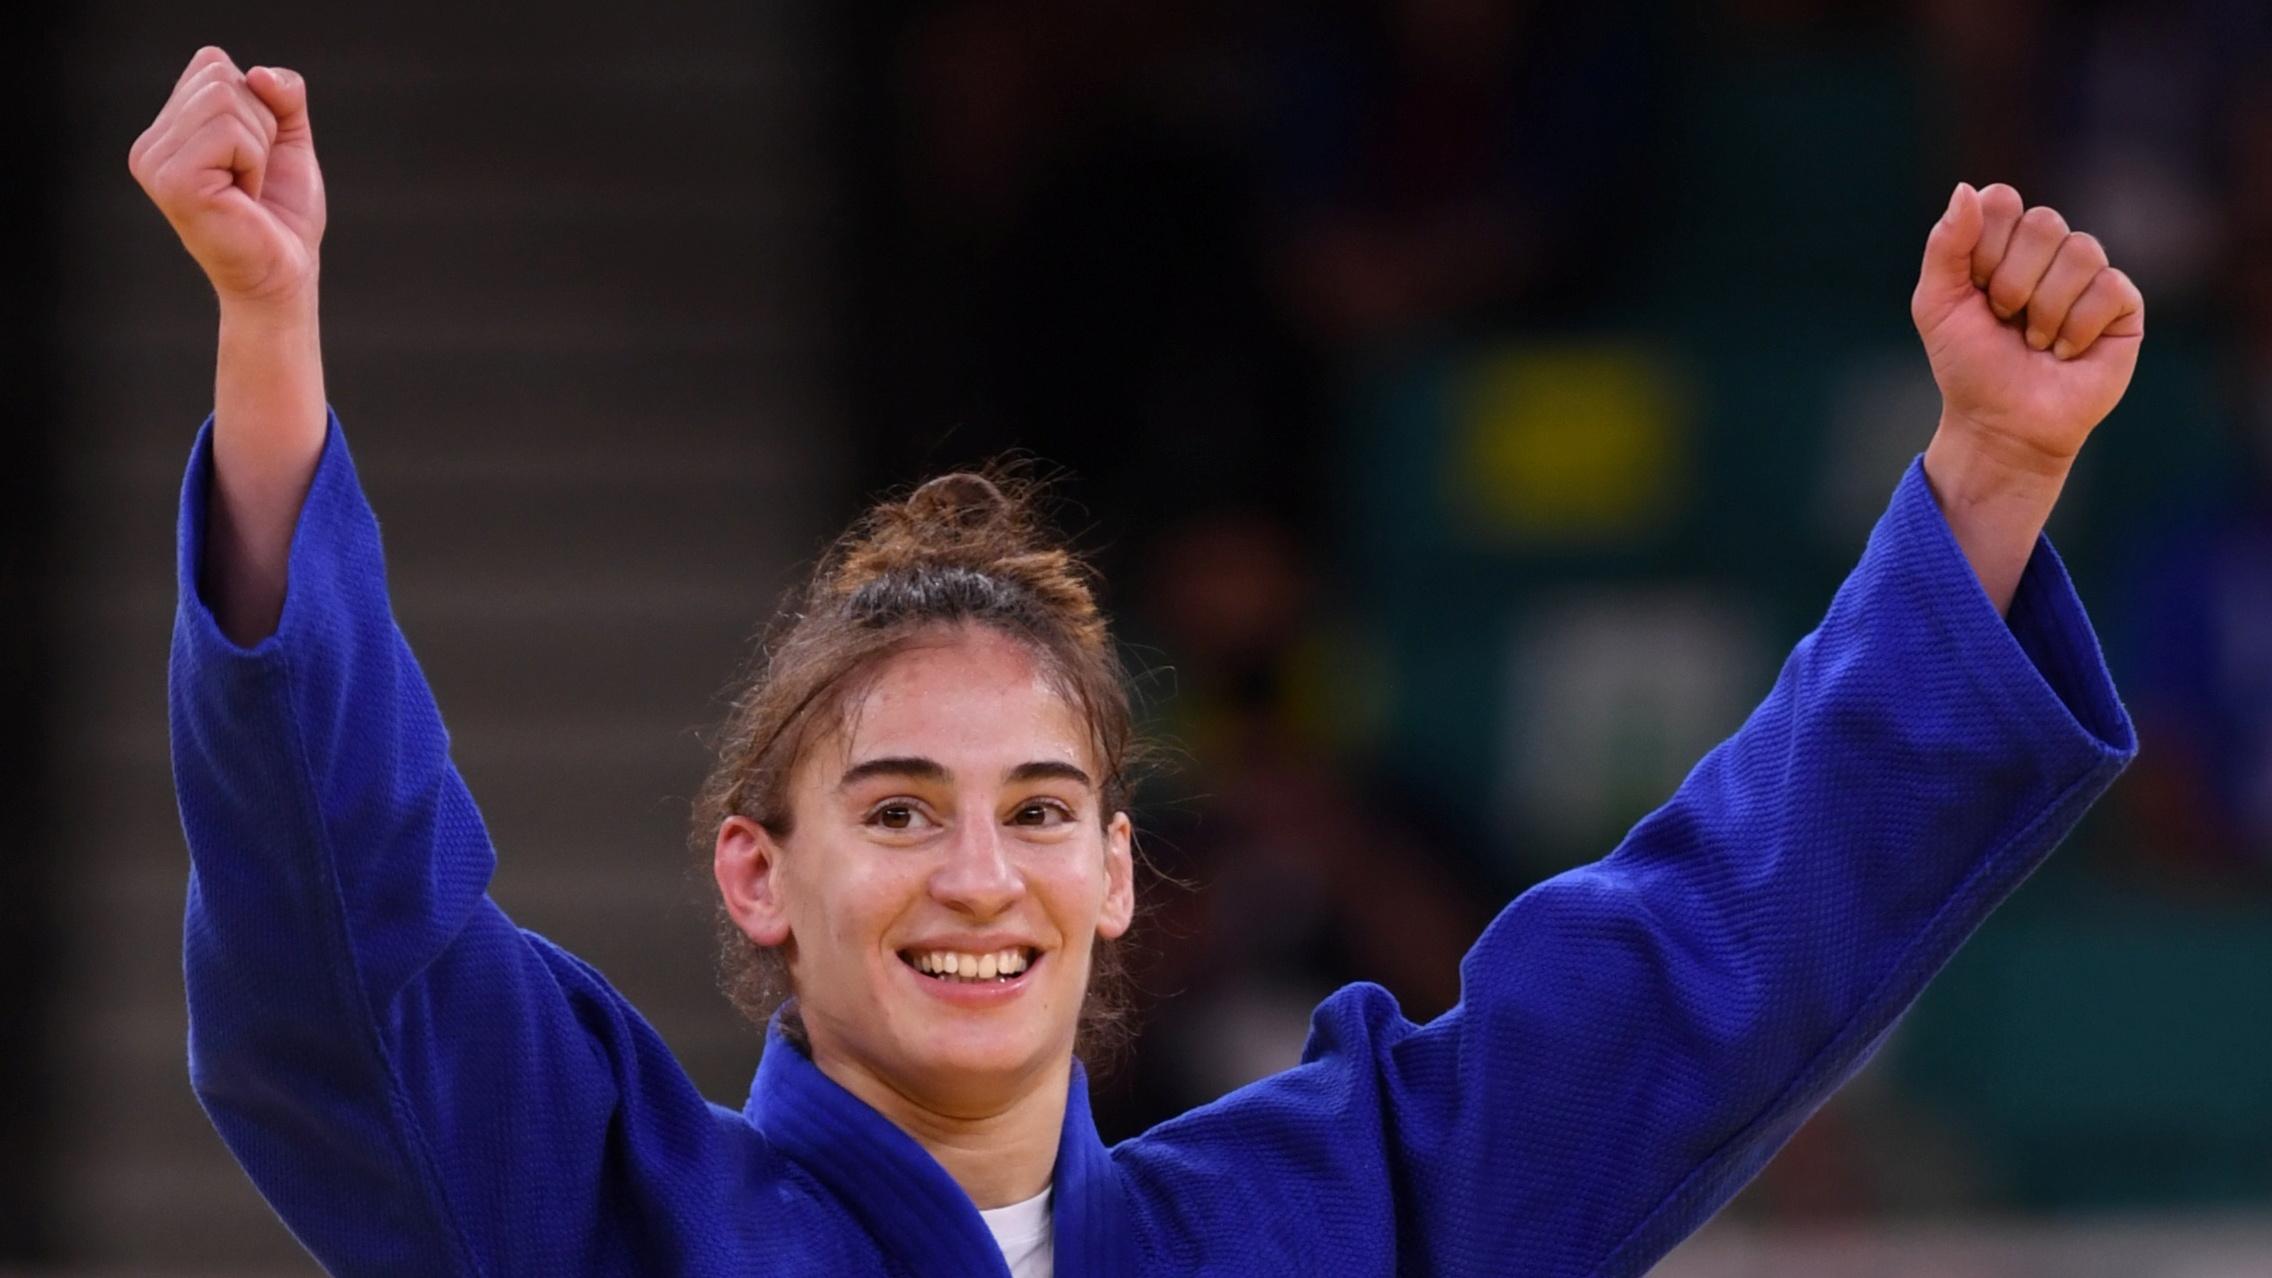 Tokyo 2020 Olympics - Judo - Women's 57kg - Gold medal match - Nippon Budokan - Tokyo, Japan - July 26, 2021. Nora Gjakova of Kosovo celebrates after winning gold against Sarah Leonie Cysique of France REUTERS/Annegret Hilse